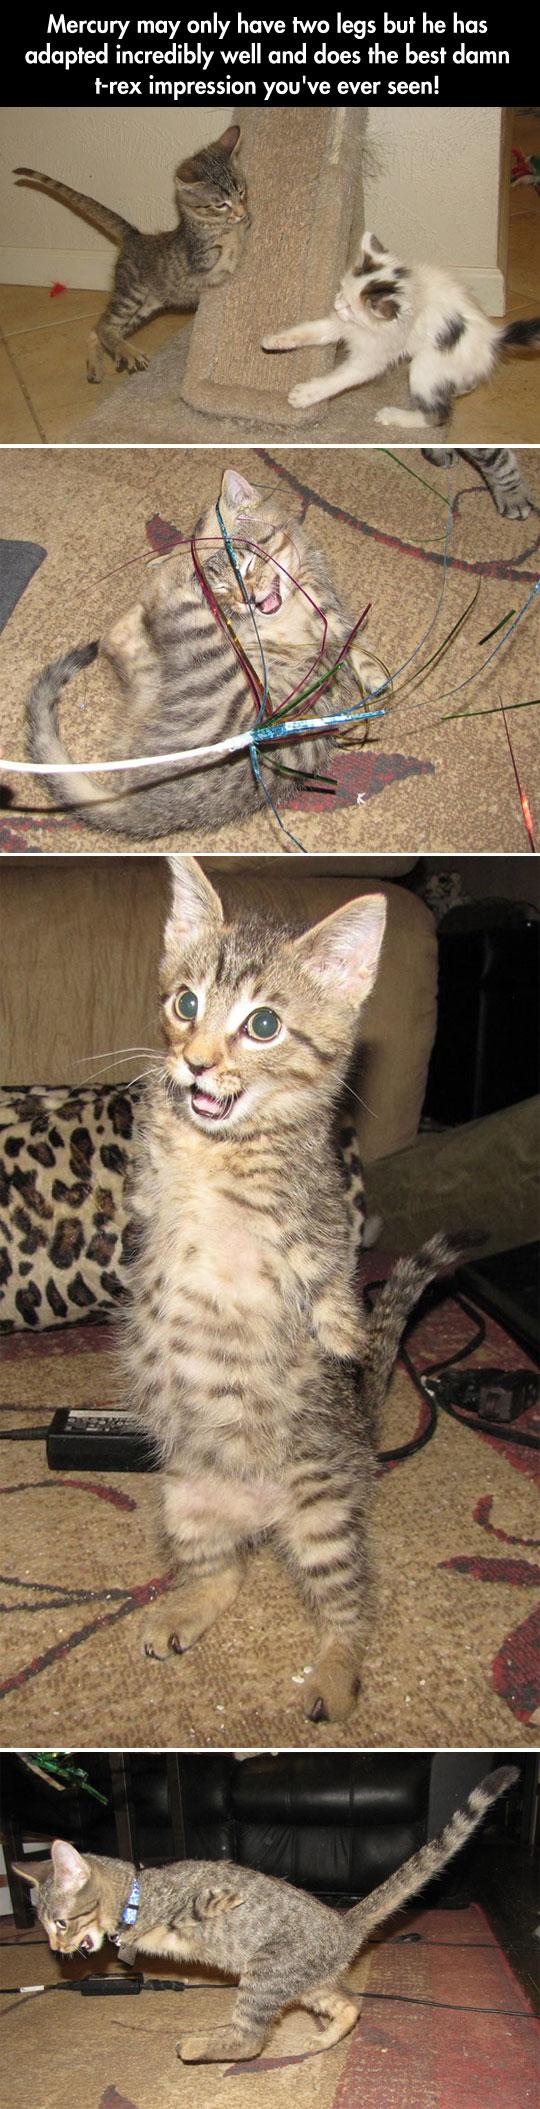 cute-cat-no-legs-playing